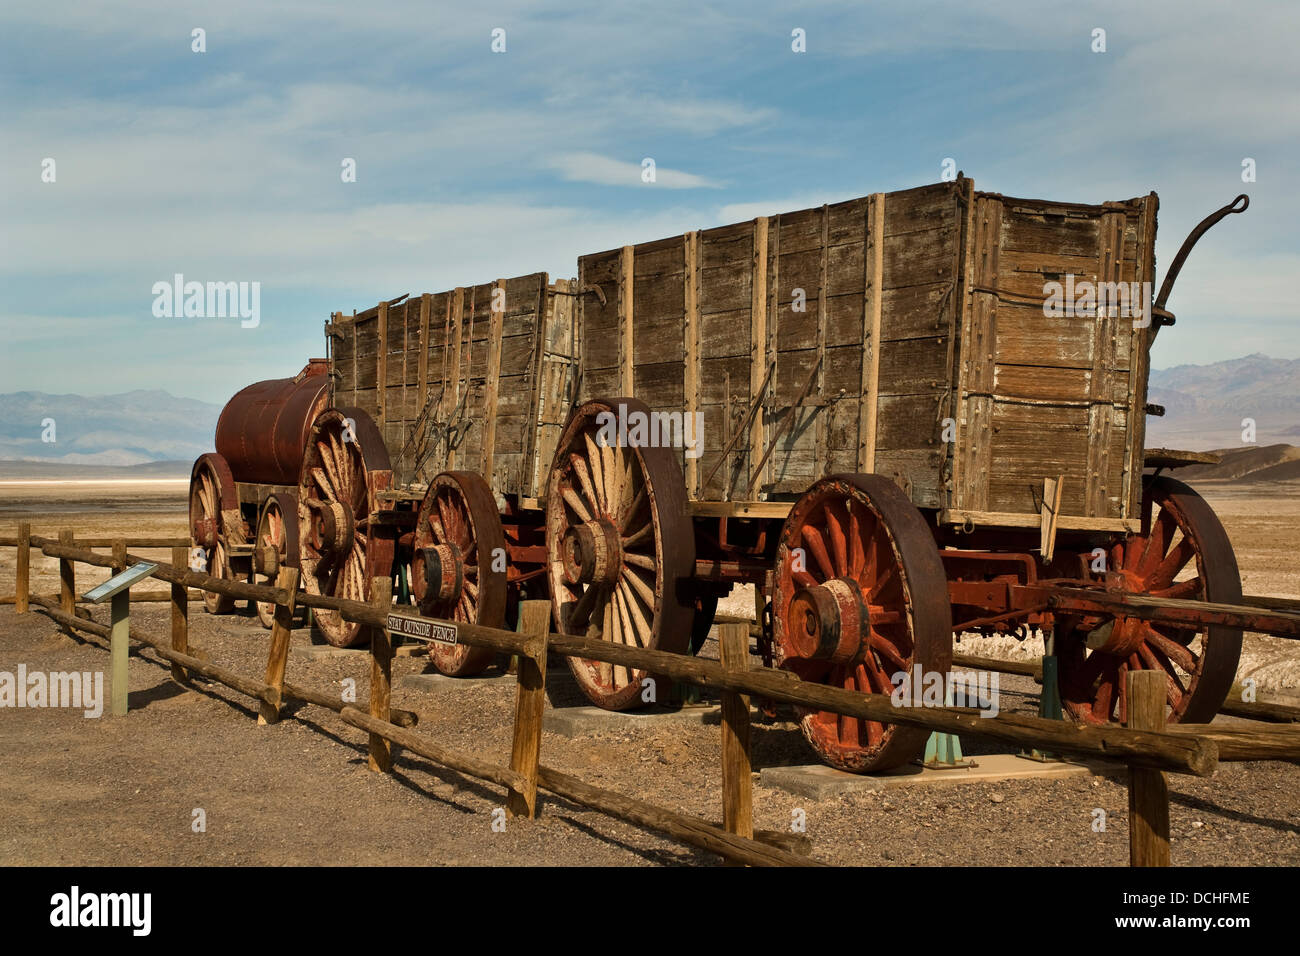 Twenty Mule Team Wagons, Harmony Borax Works, Death Valley